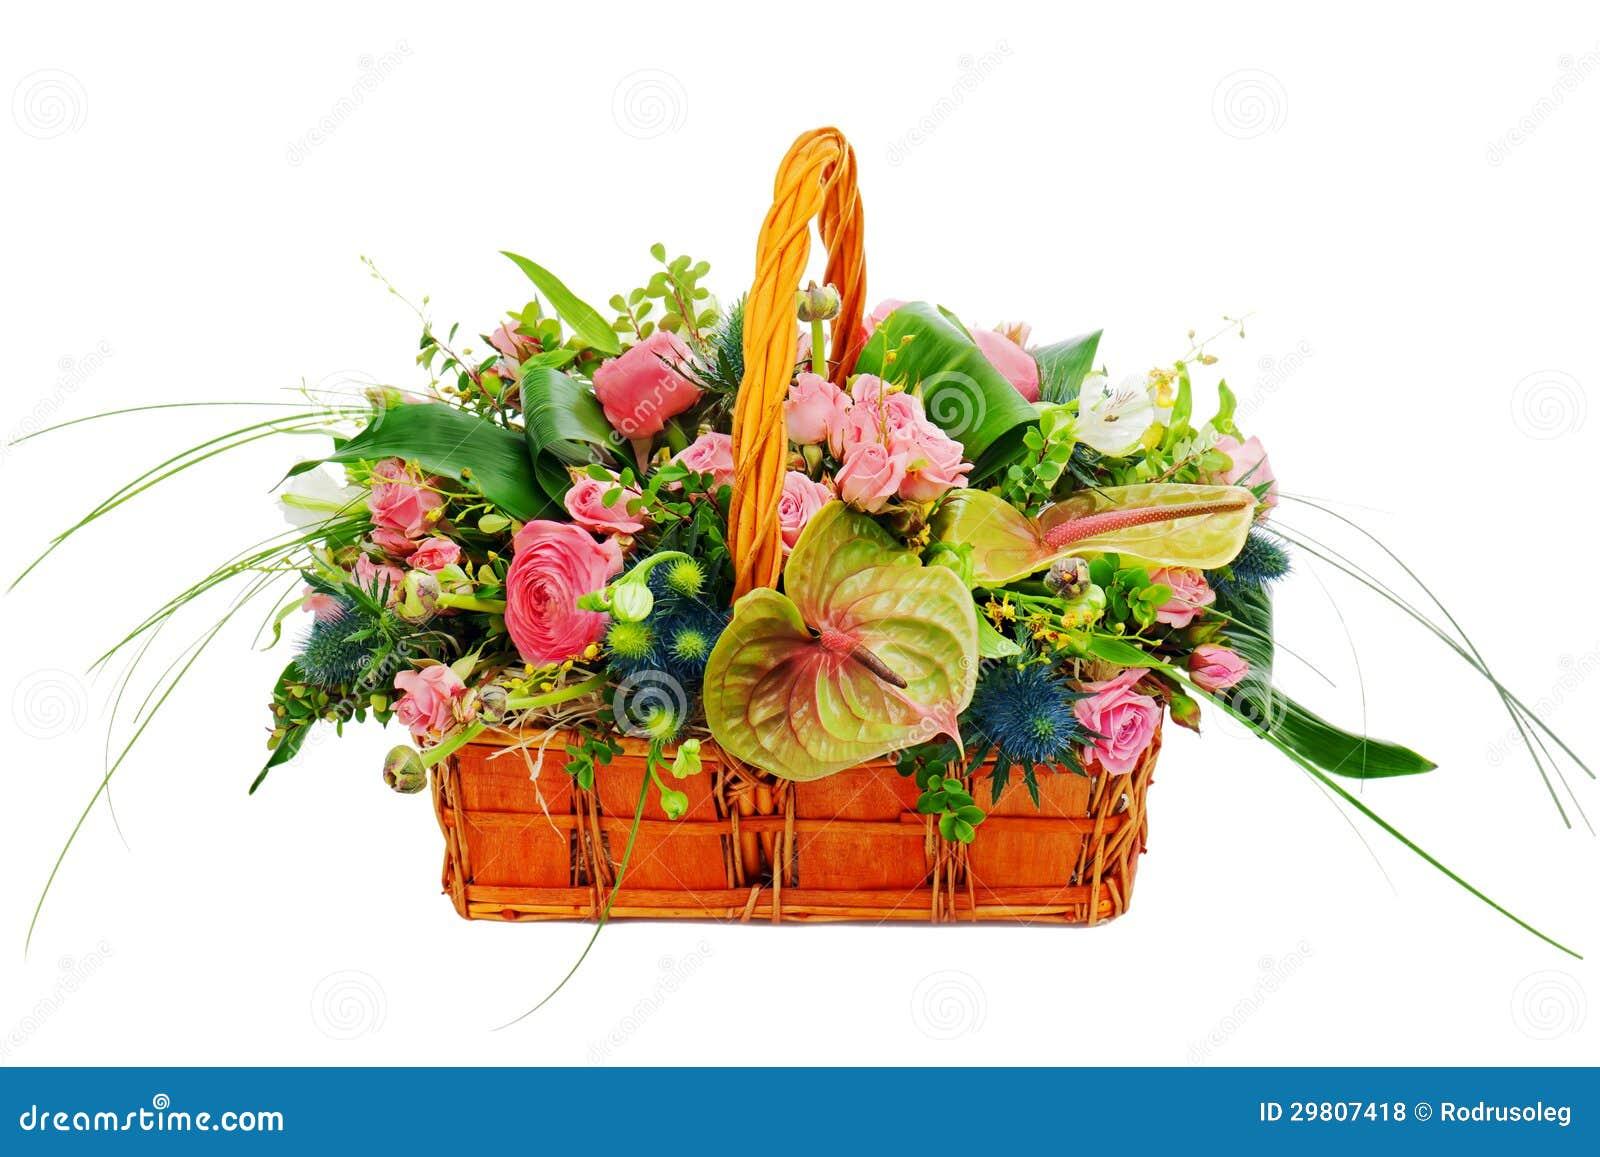 Flower Arrangements Gift Baskets : Flower bouquet arrangement centerpiece in a wicker gift